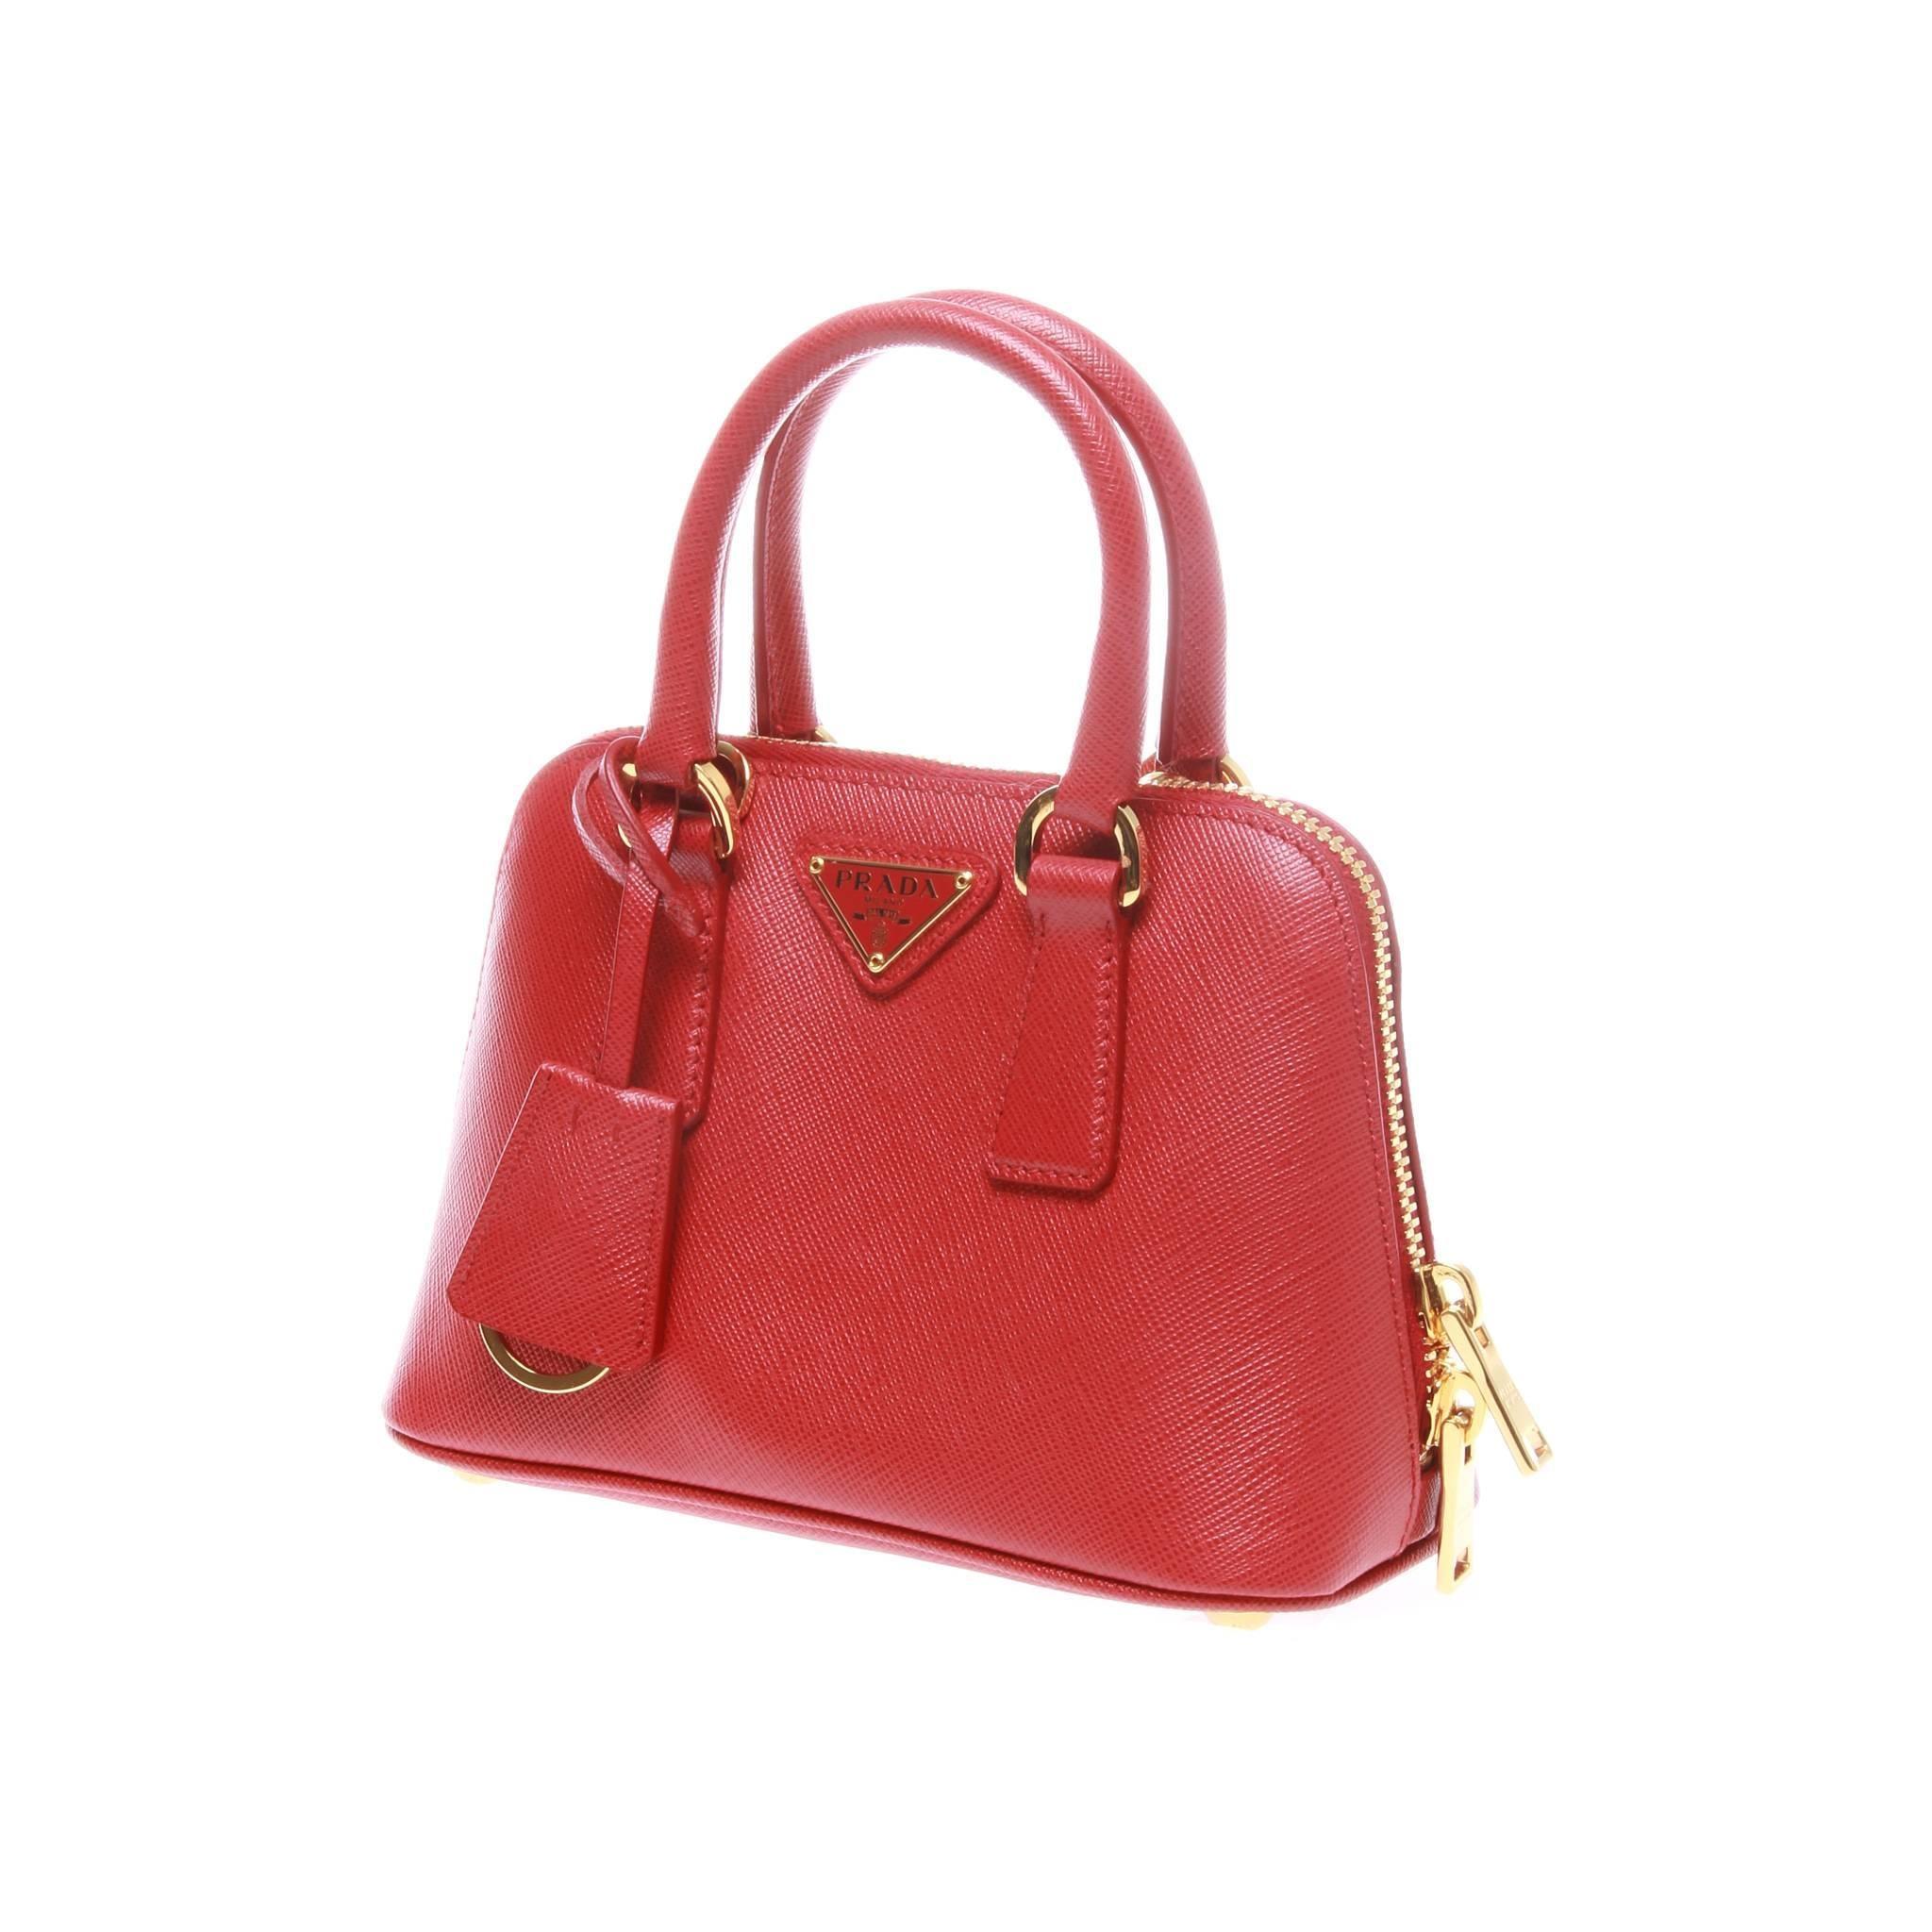 ... where can i buy prada saffiano lux mini promenade bag beautifully  structured in a dome silhouette ... d6cf86a955e27